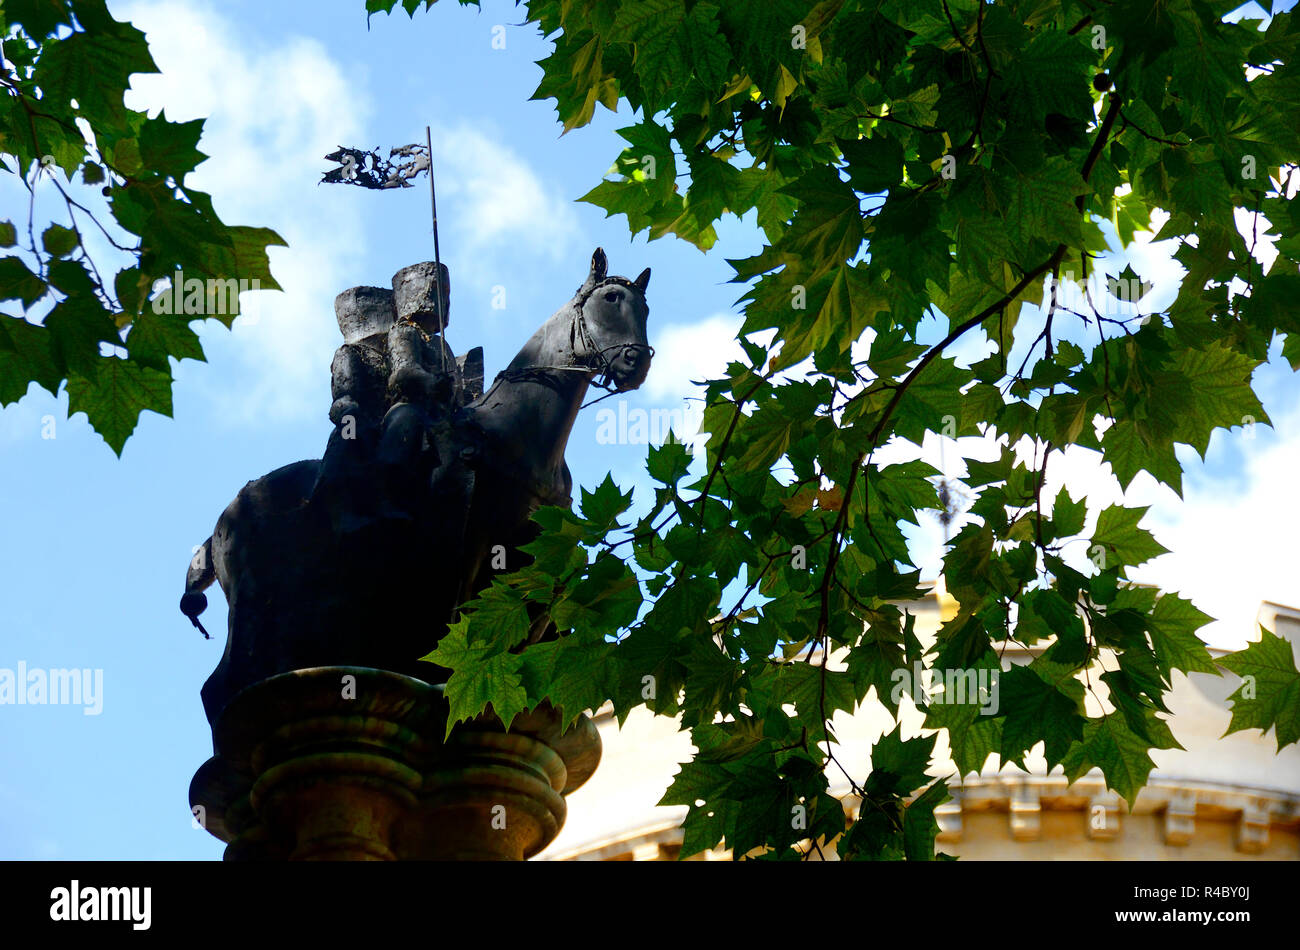 Knights Templar Column (Nicola Hicks: 2000) - statue in Church Court, Inner Temple, central London, England, UK. - Stock Image